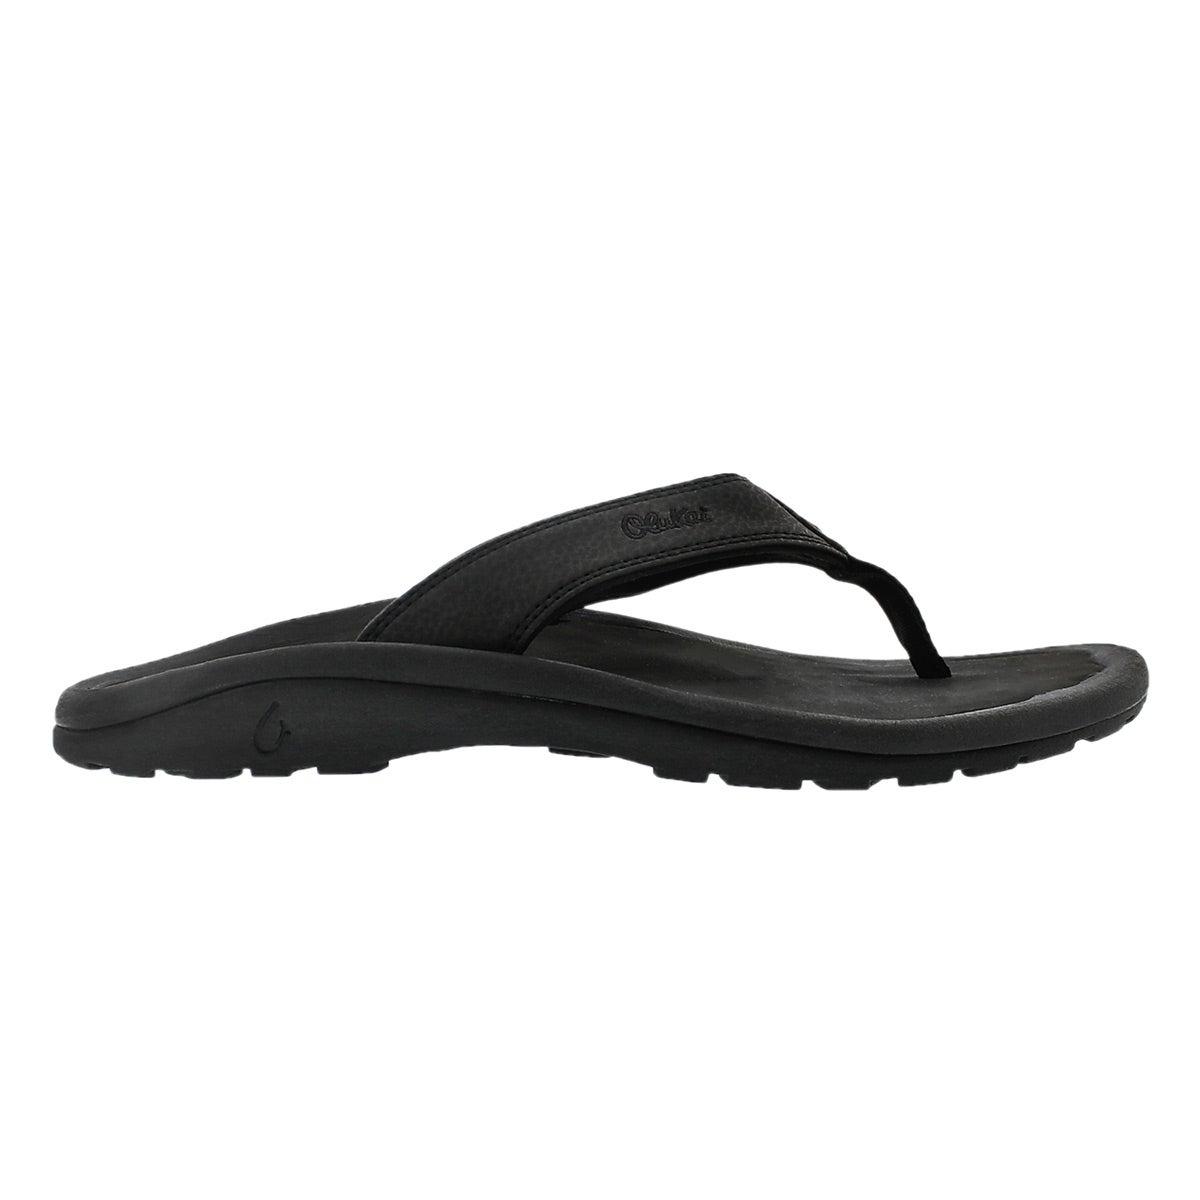 Mns Ohana black thong sandal